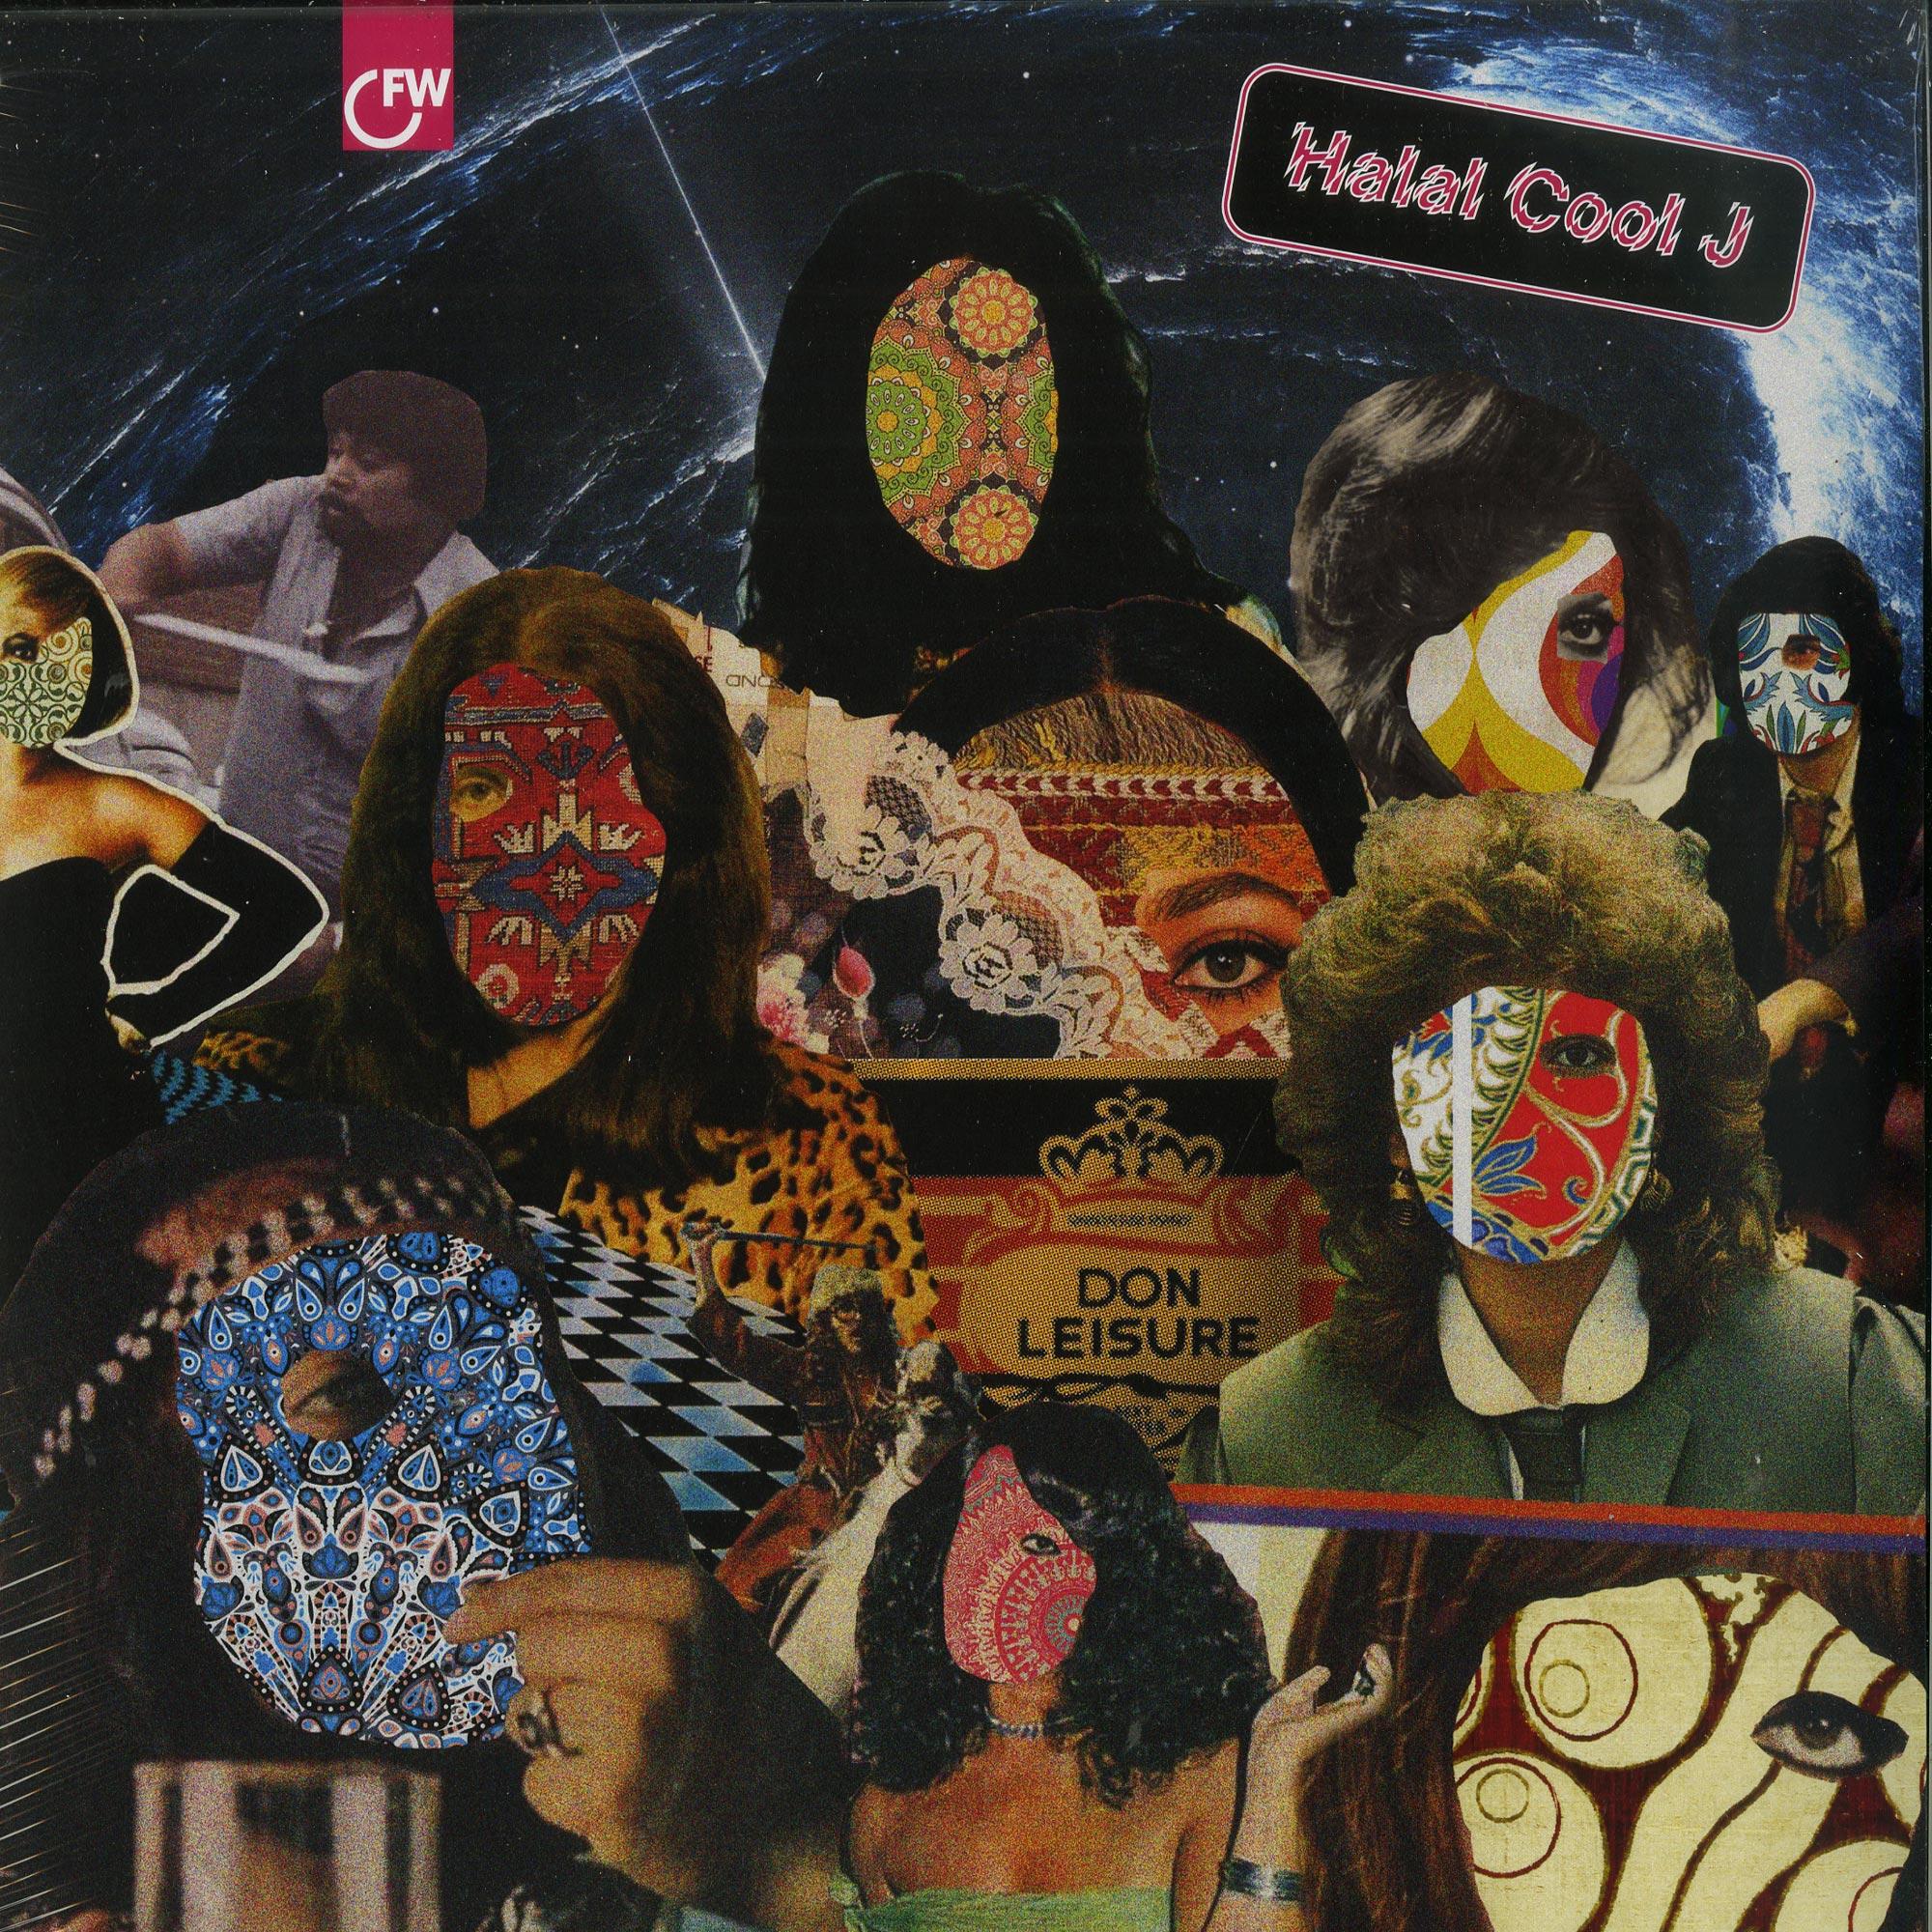 Don Leisure - HALAL COOL J